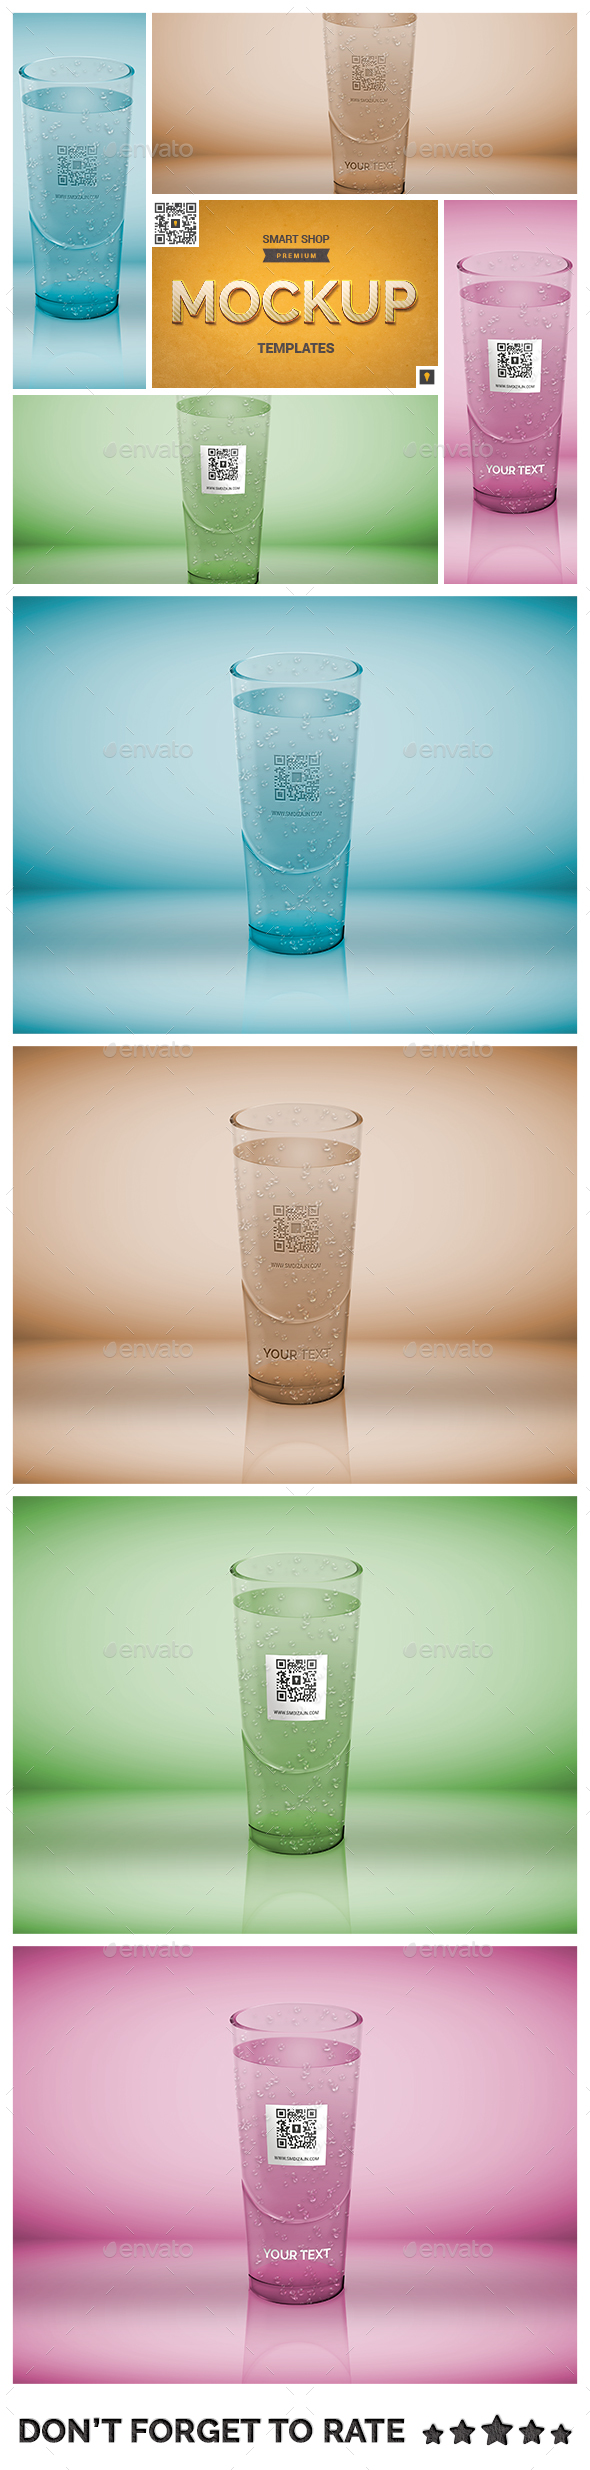 Logo Mockup on Translucent Glass Object - Miscellaneous Product Mock-Ups